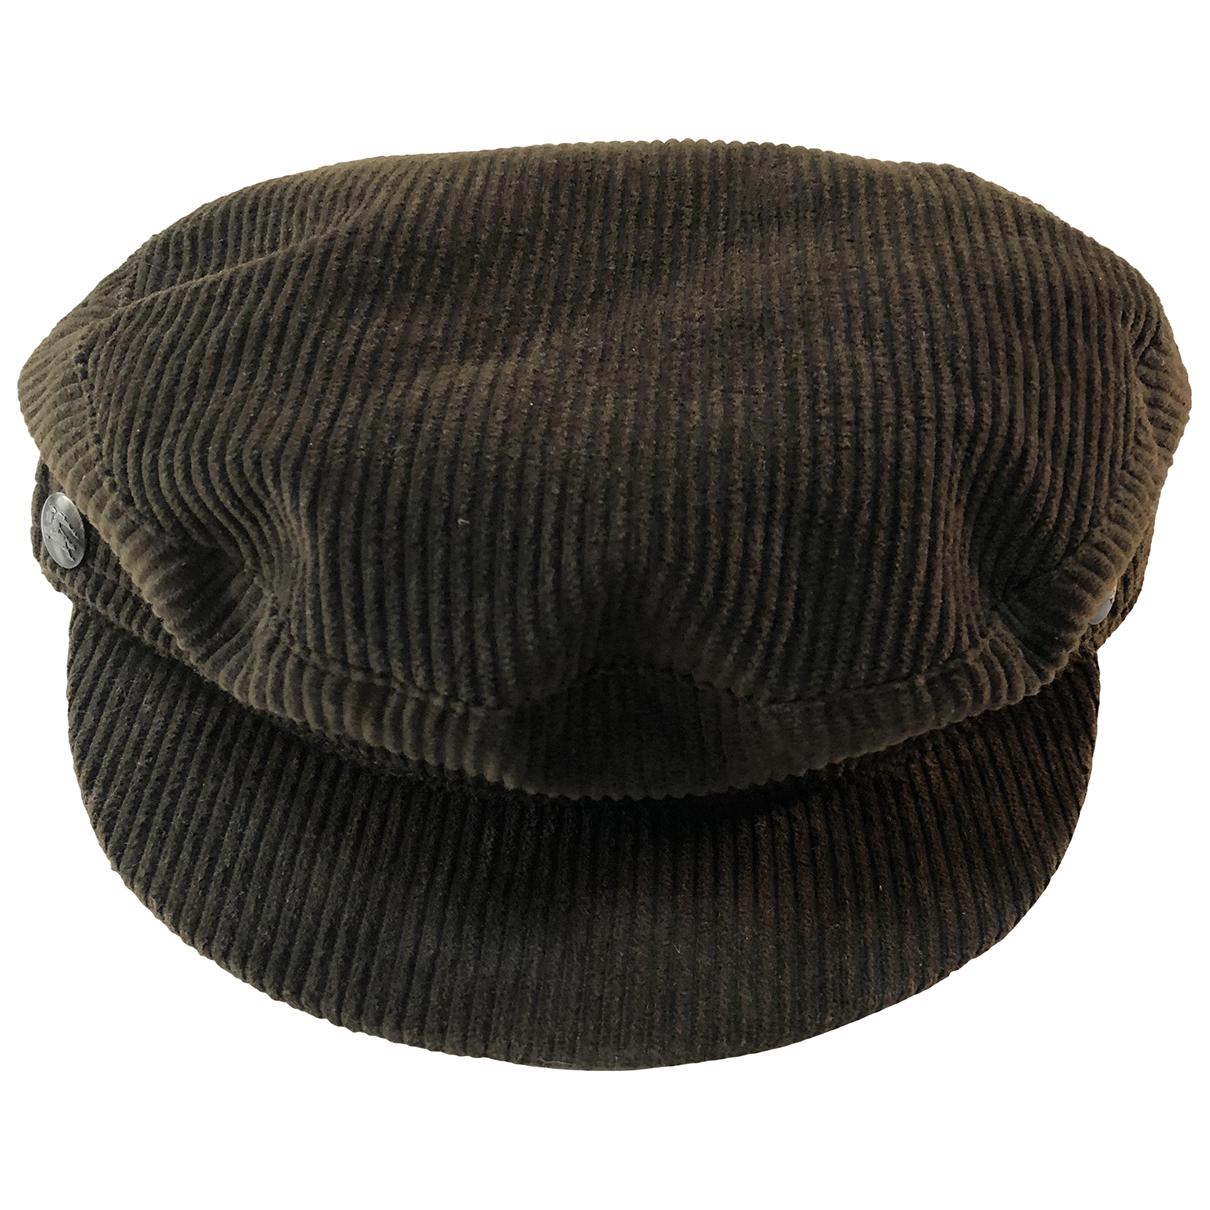 Burberry \N Green Cotton hat for Women M International